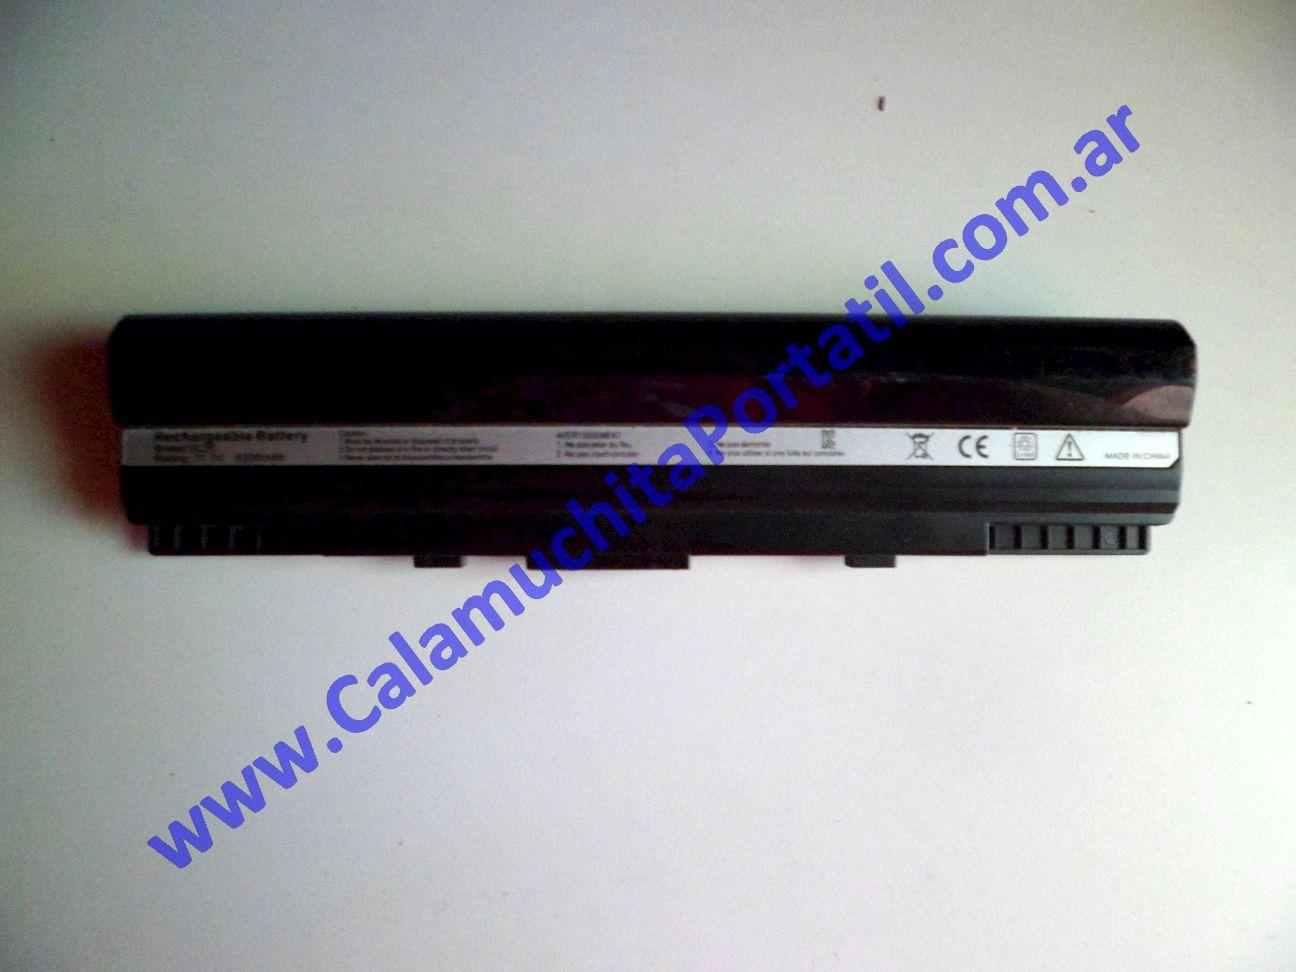 0027BAA Batería Asus Eee PC 1201n